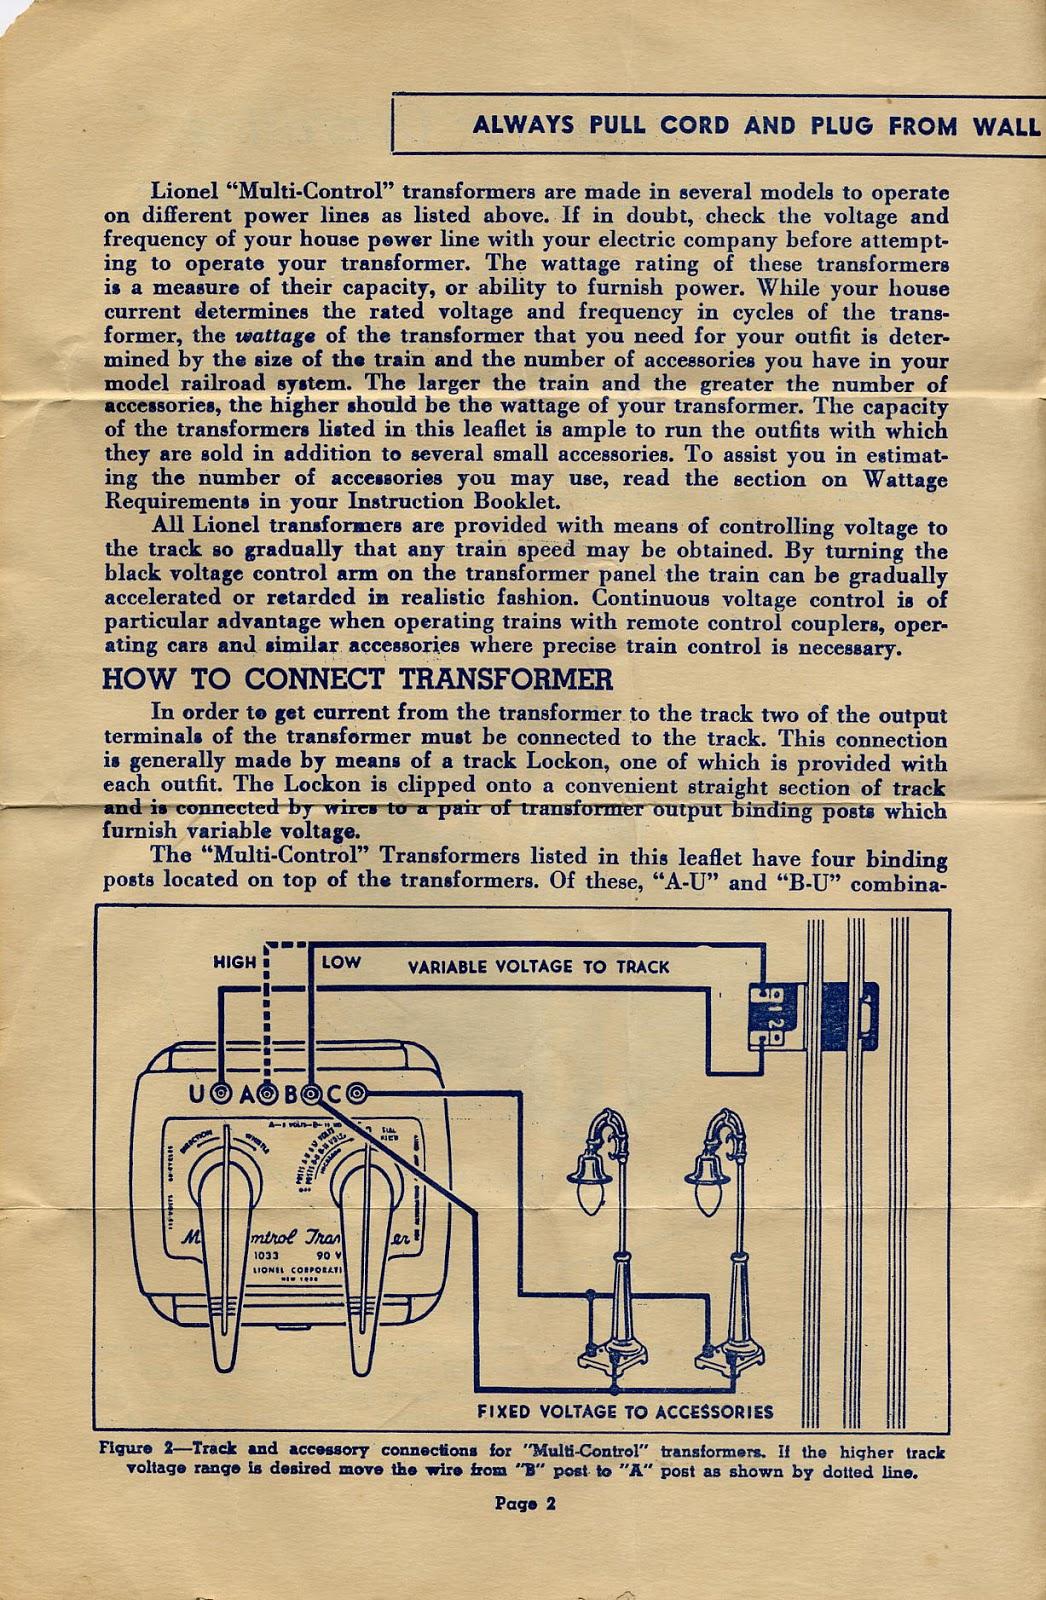 lionel postwar wiring diagrams model train wiring diagrams lionel kw transformer wiring diagram lionel 1033 transformer [ 1046 x 1600 Pixel ]